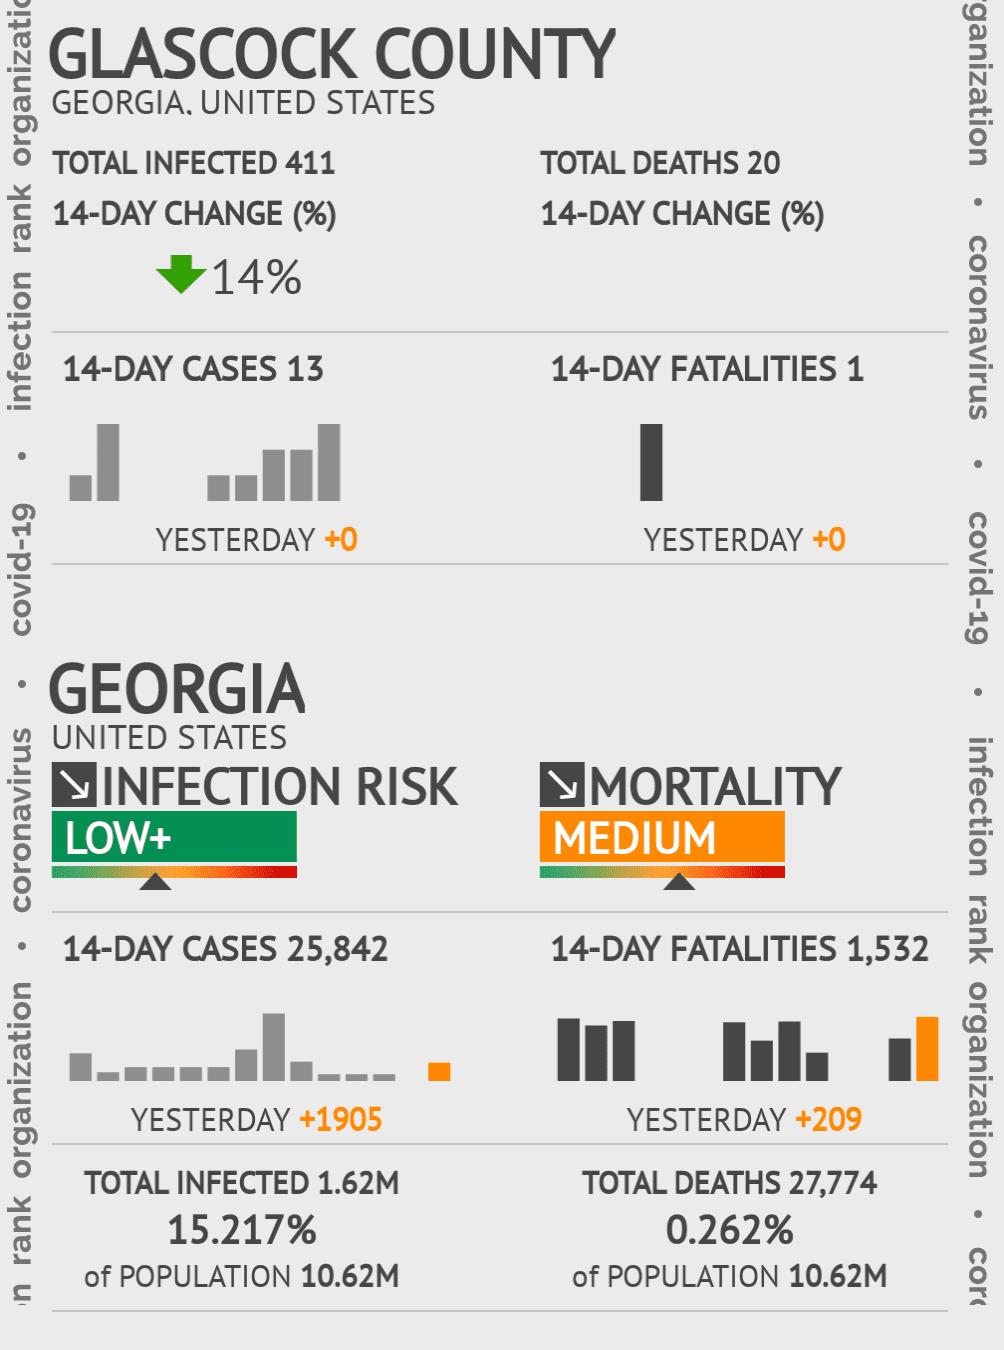 Glascock County Coronavirus Covid-19 Risk of Infection on November 27, 2020